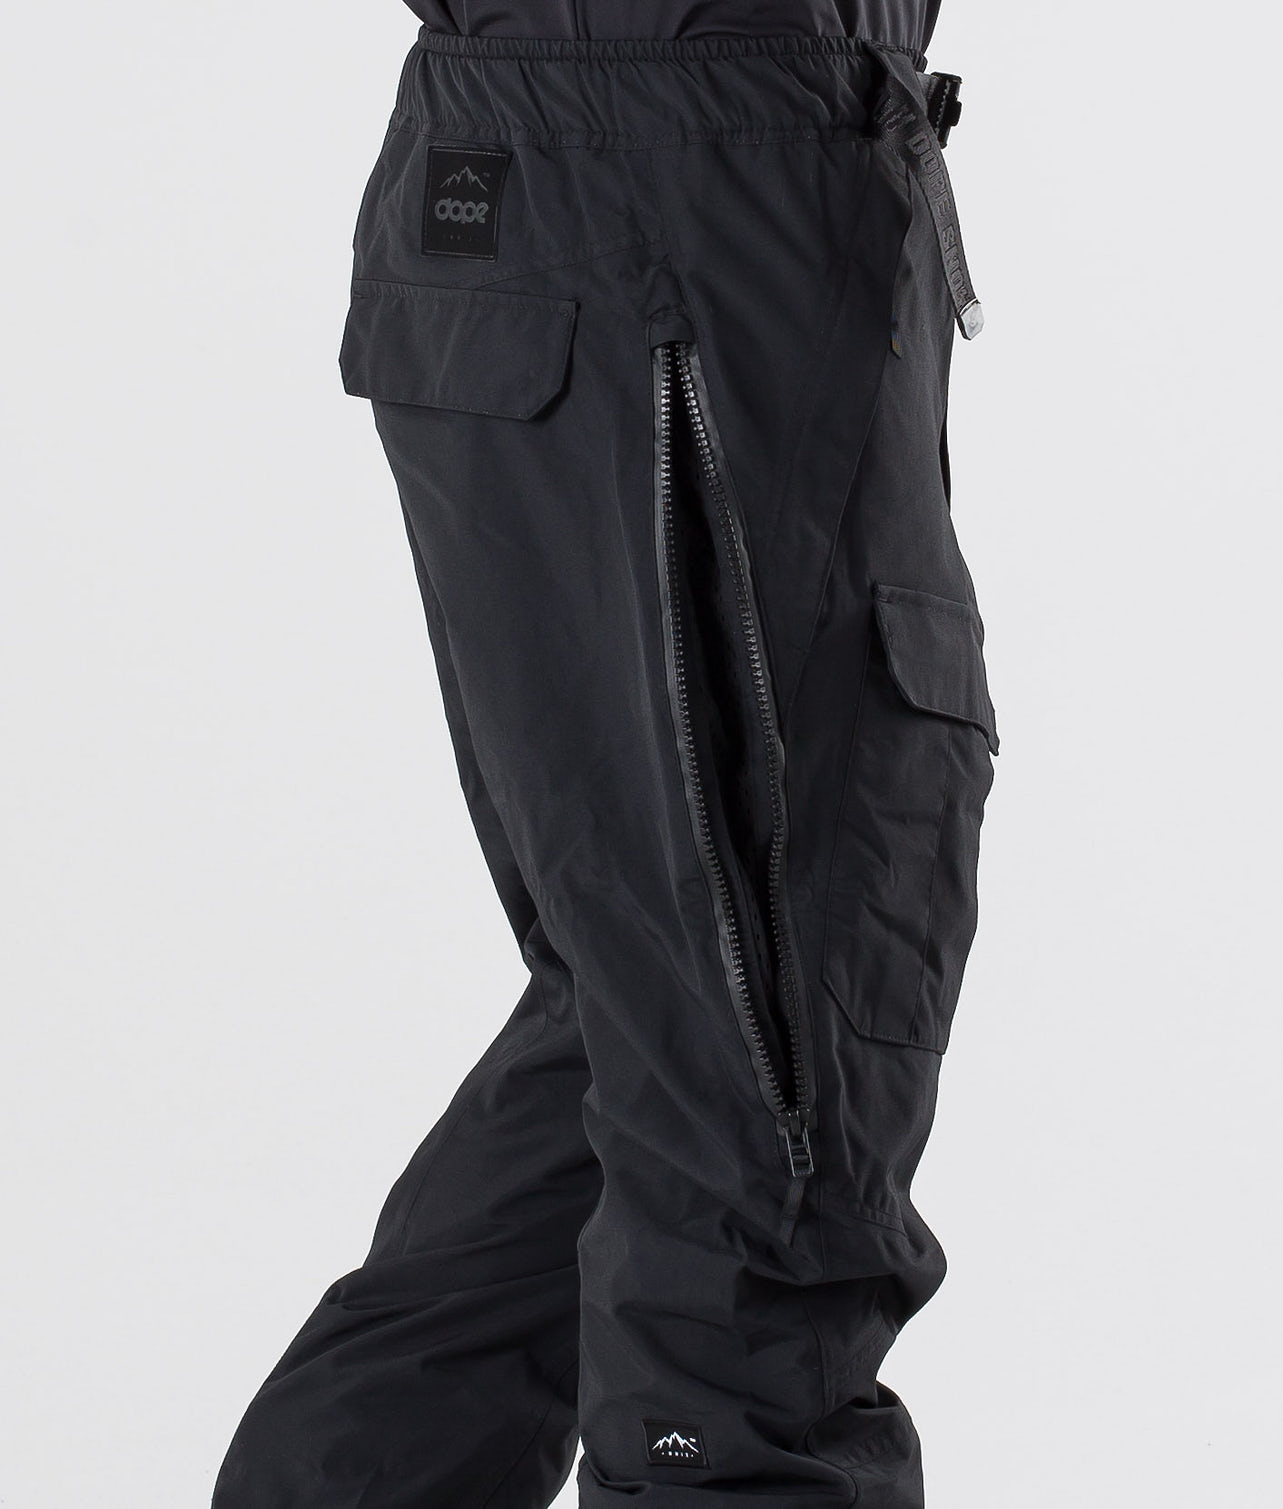 Dope Antek Snowboardbukse Black